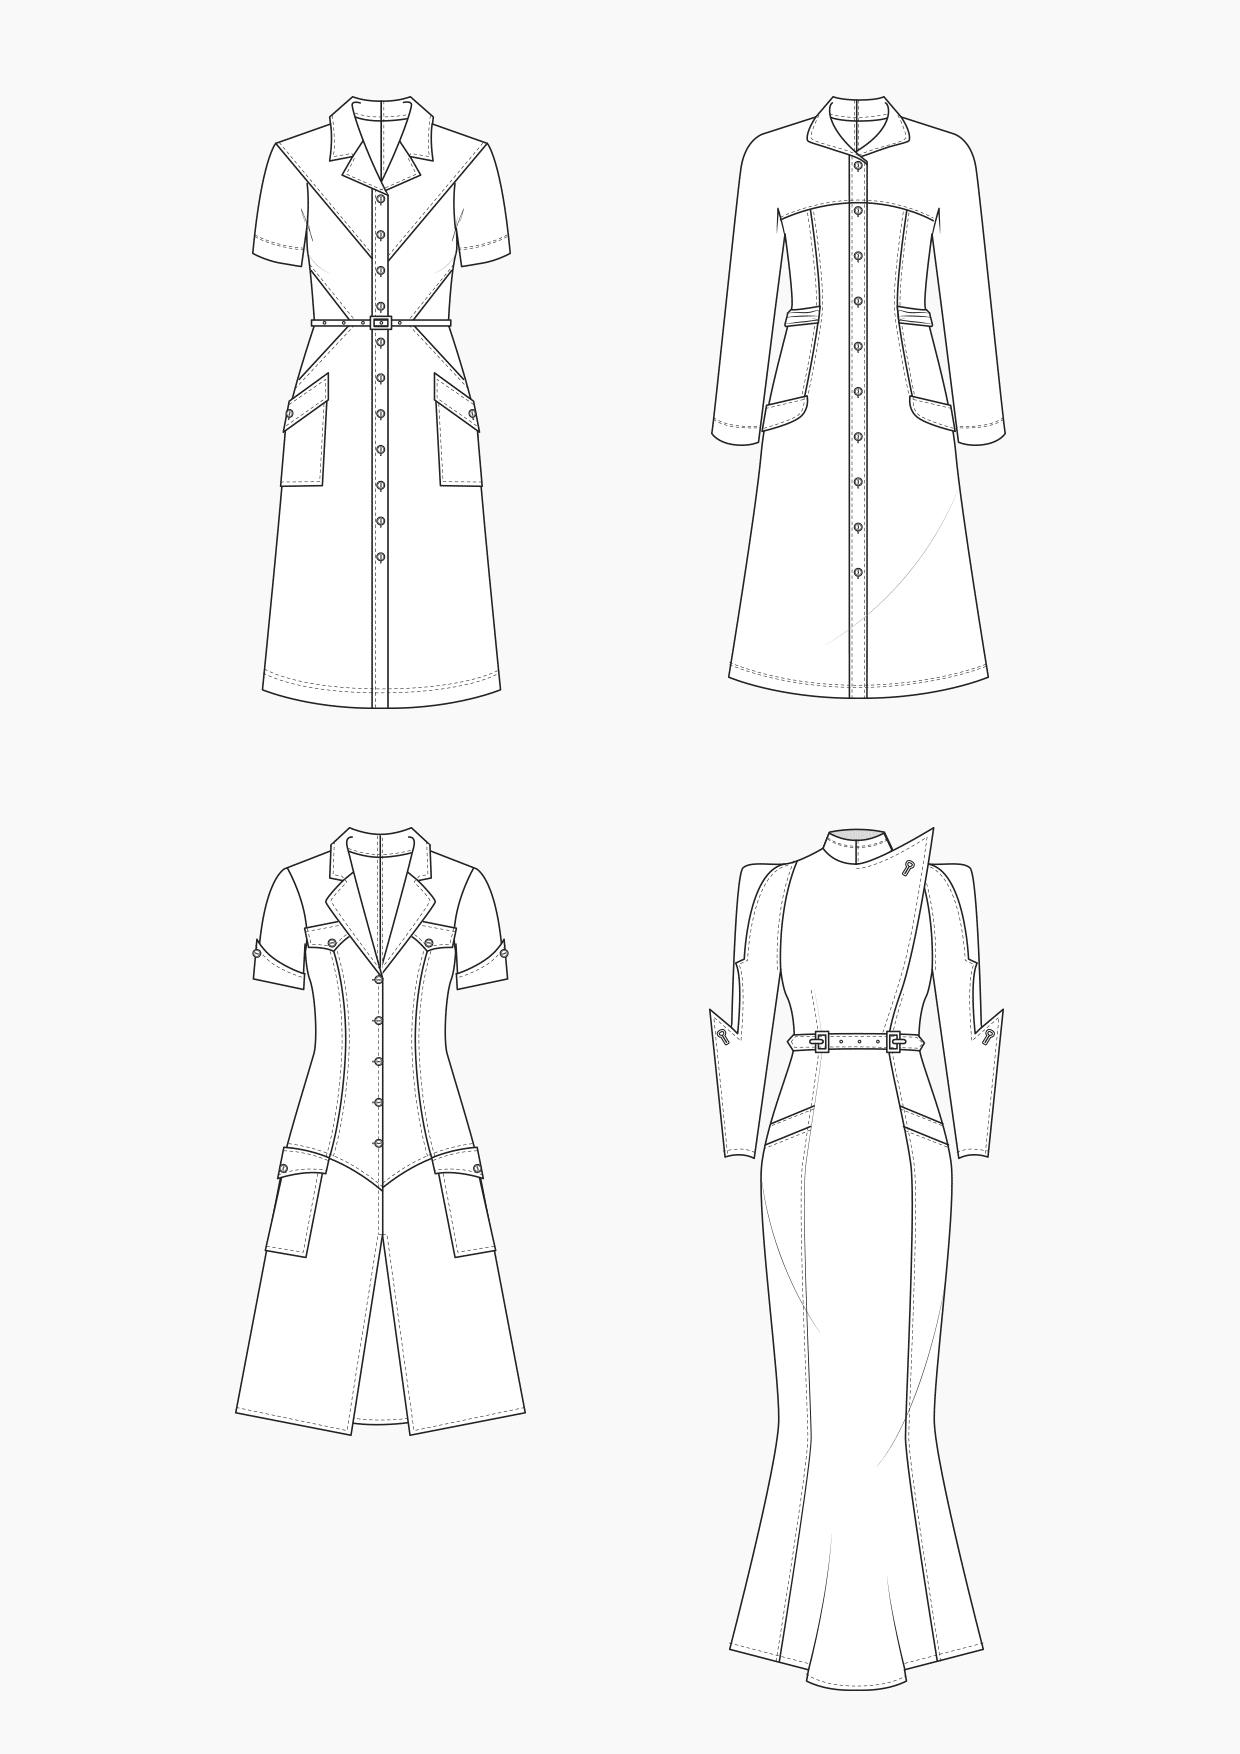 Produkt: Schnitt-Technik Hemdblusenkleider im Vintage-Look